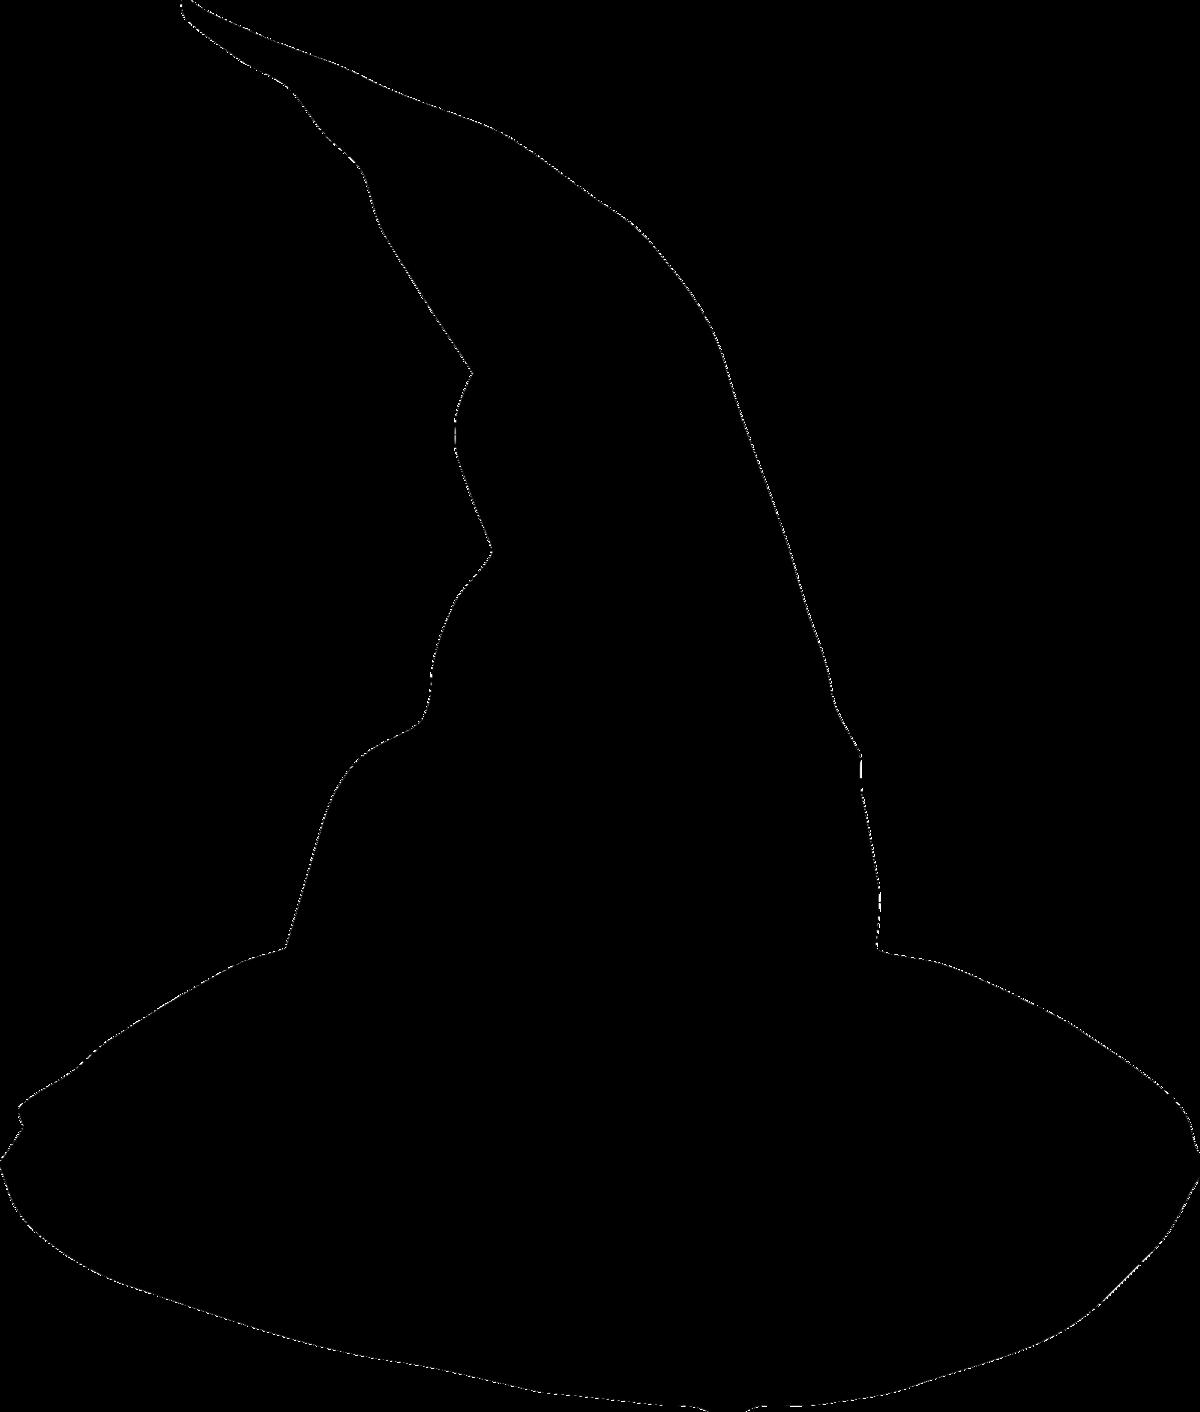 Witch hat - Wikipedia